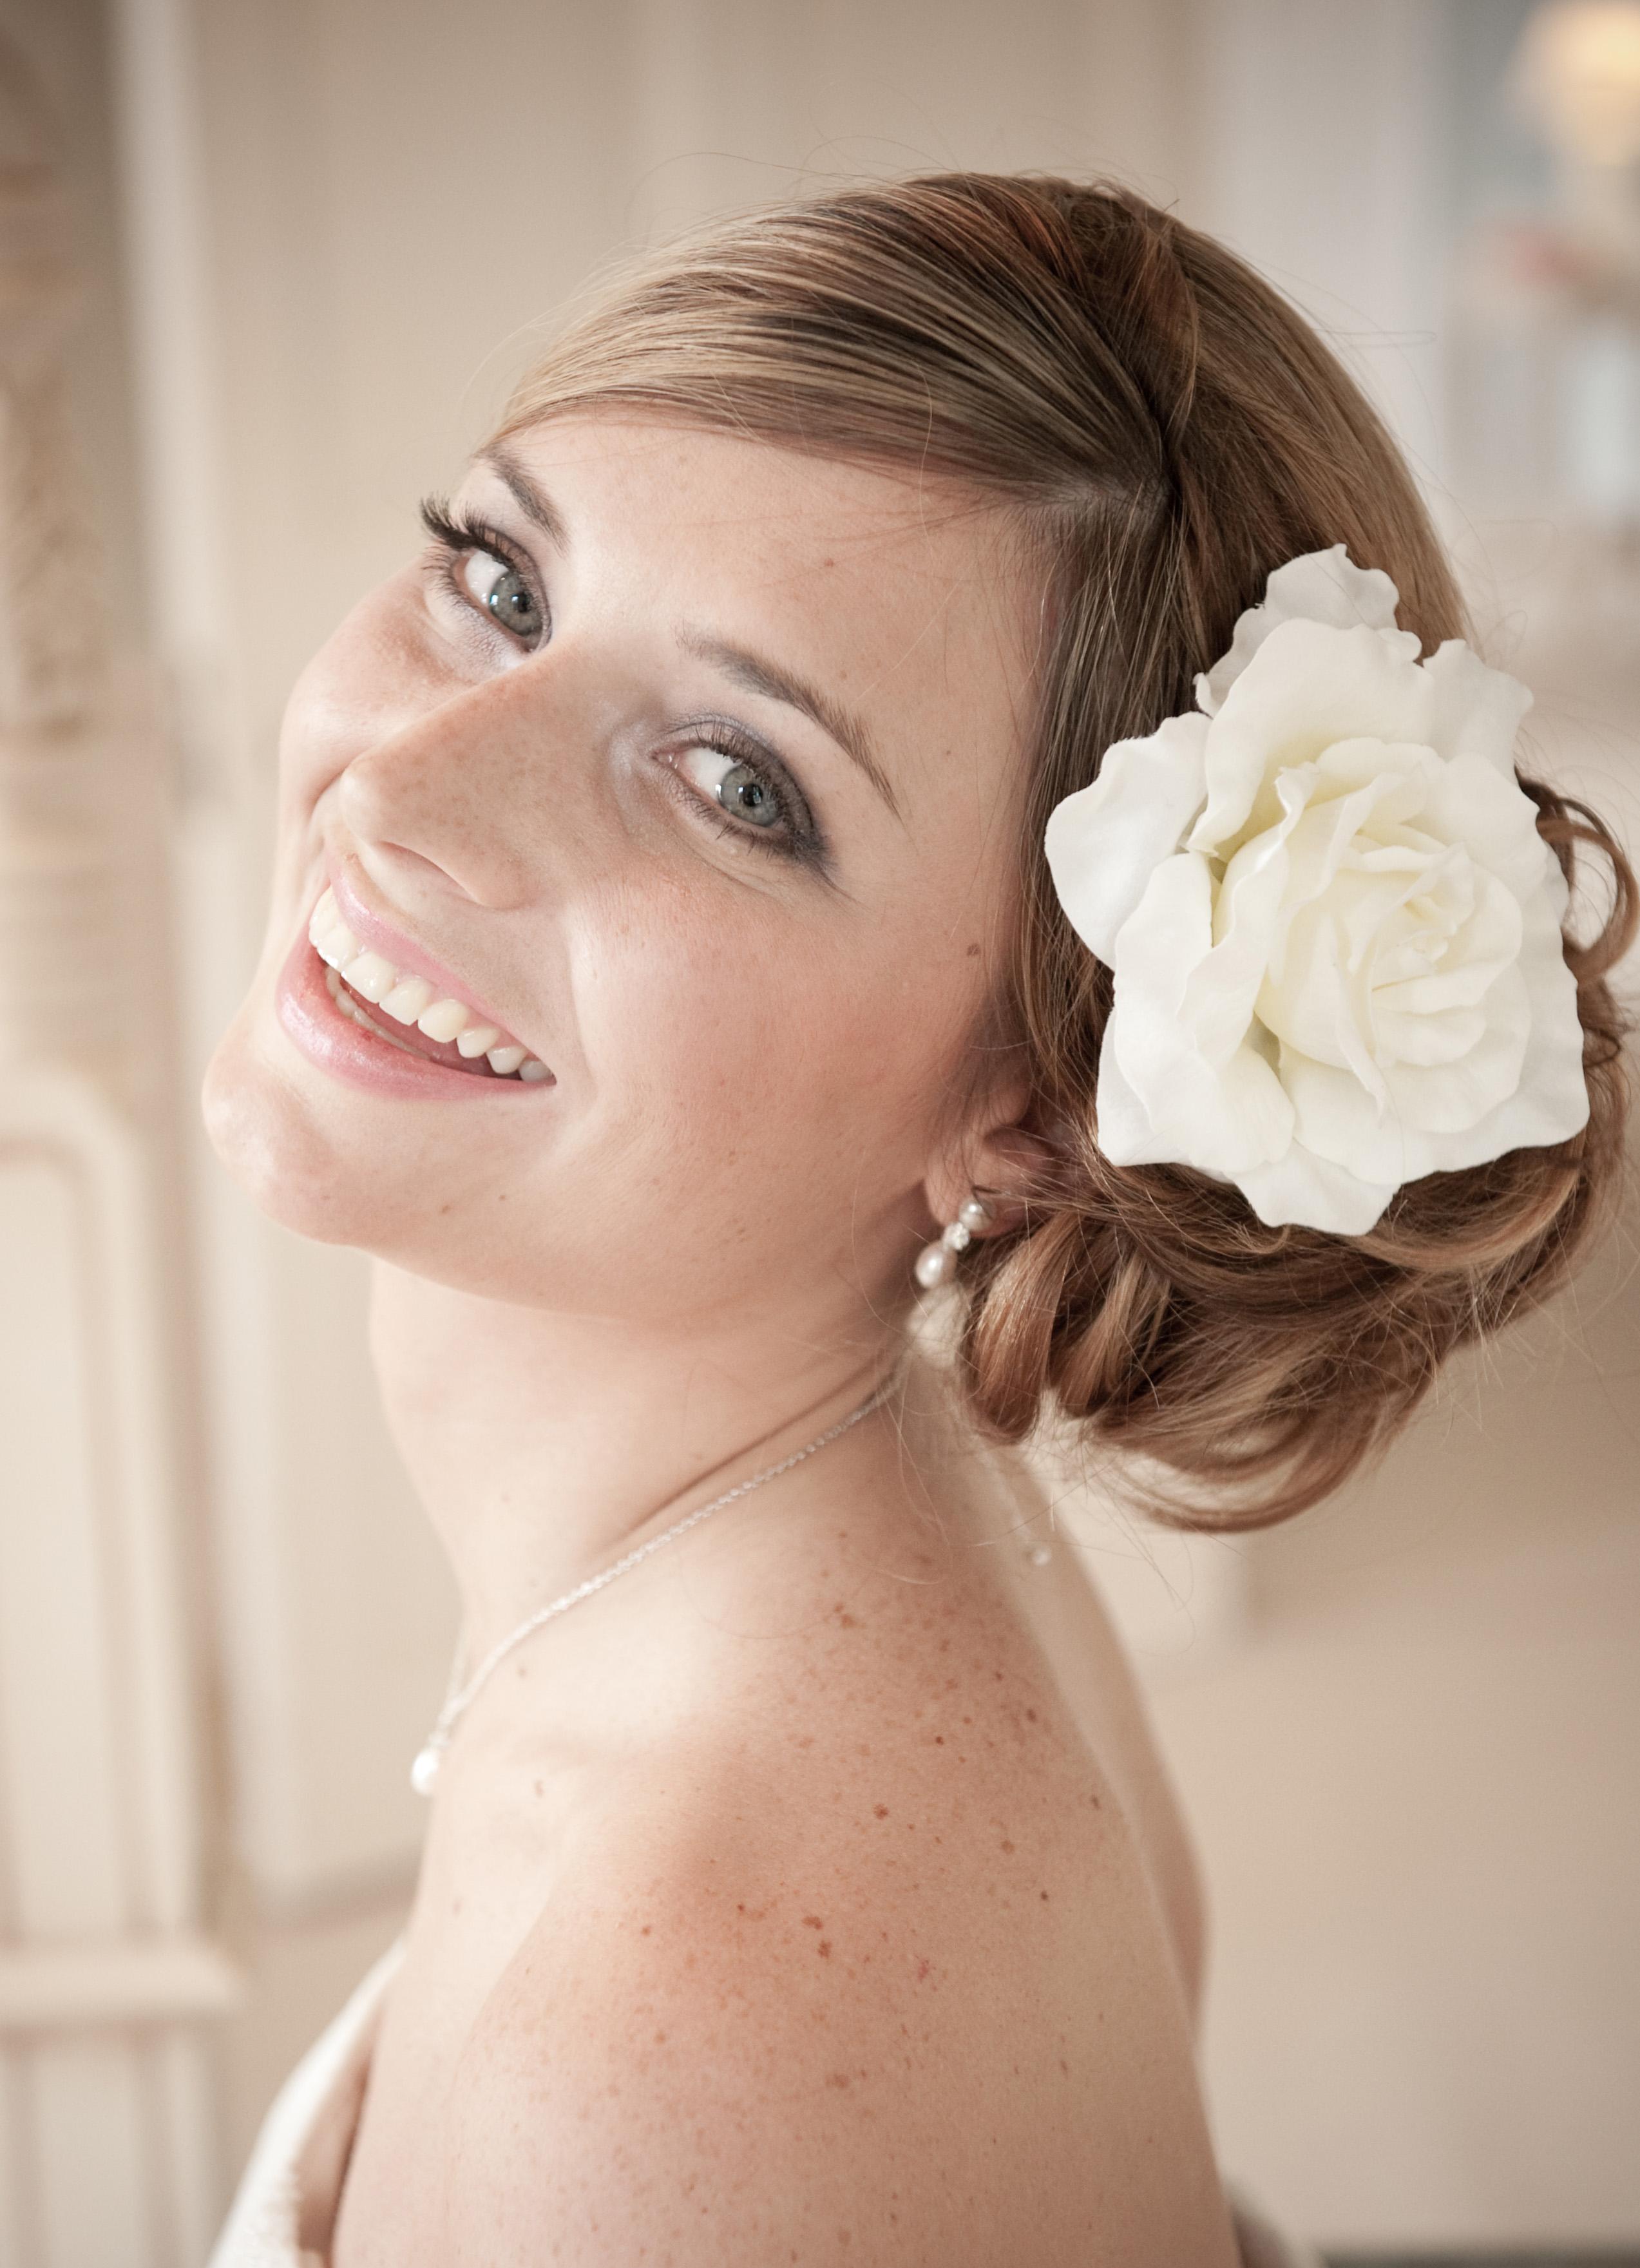 Chez Bec Madeline Rose Hair ... - chez-bec-madeline-rose-hair-clip-c3a2c2a334